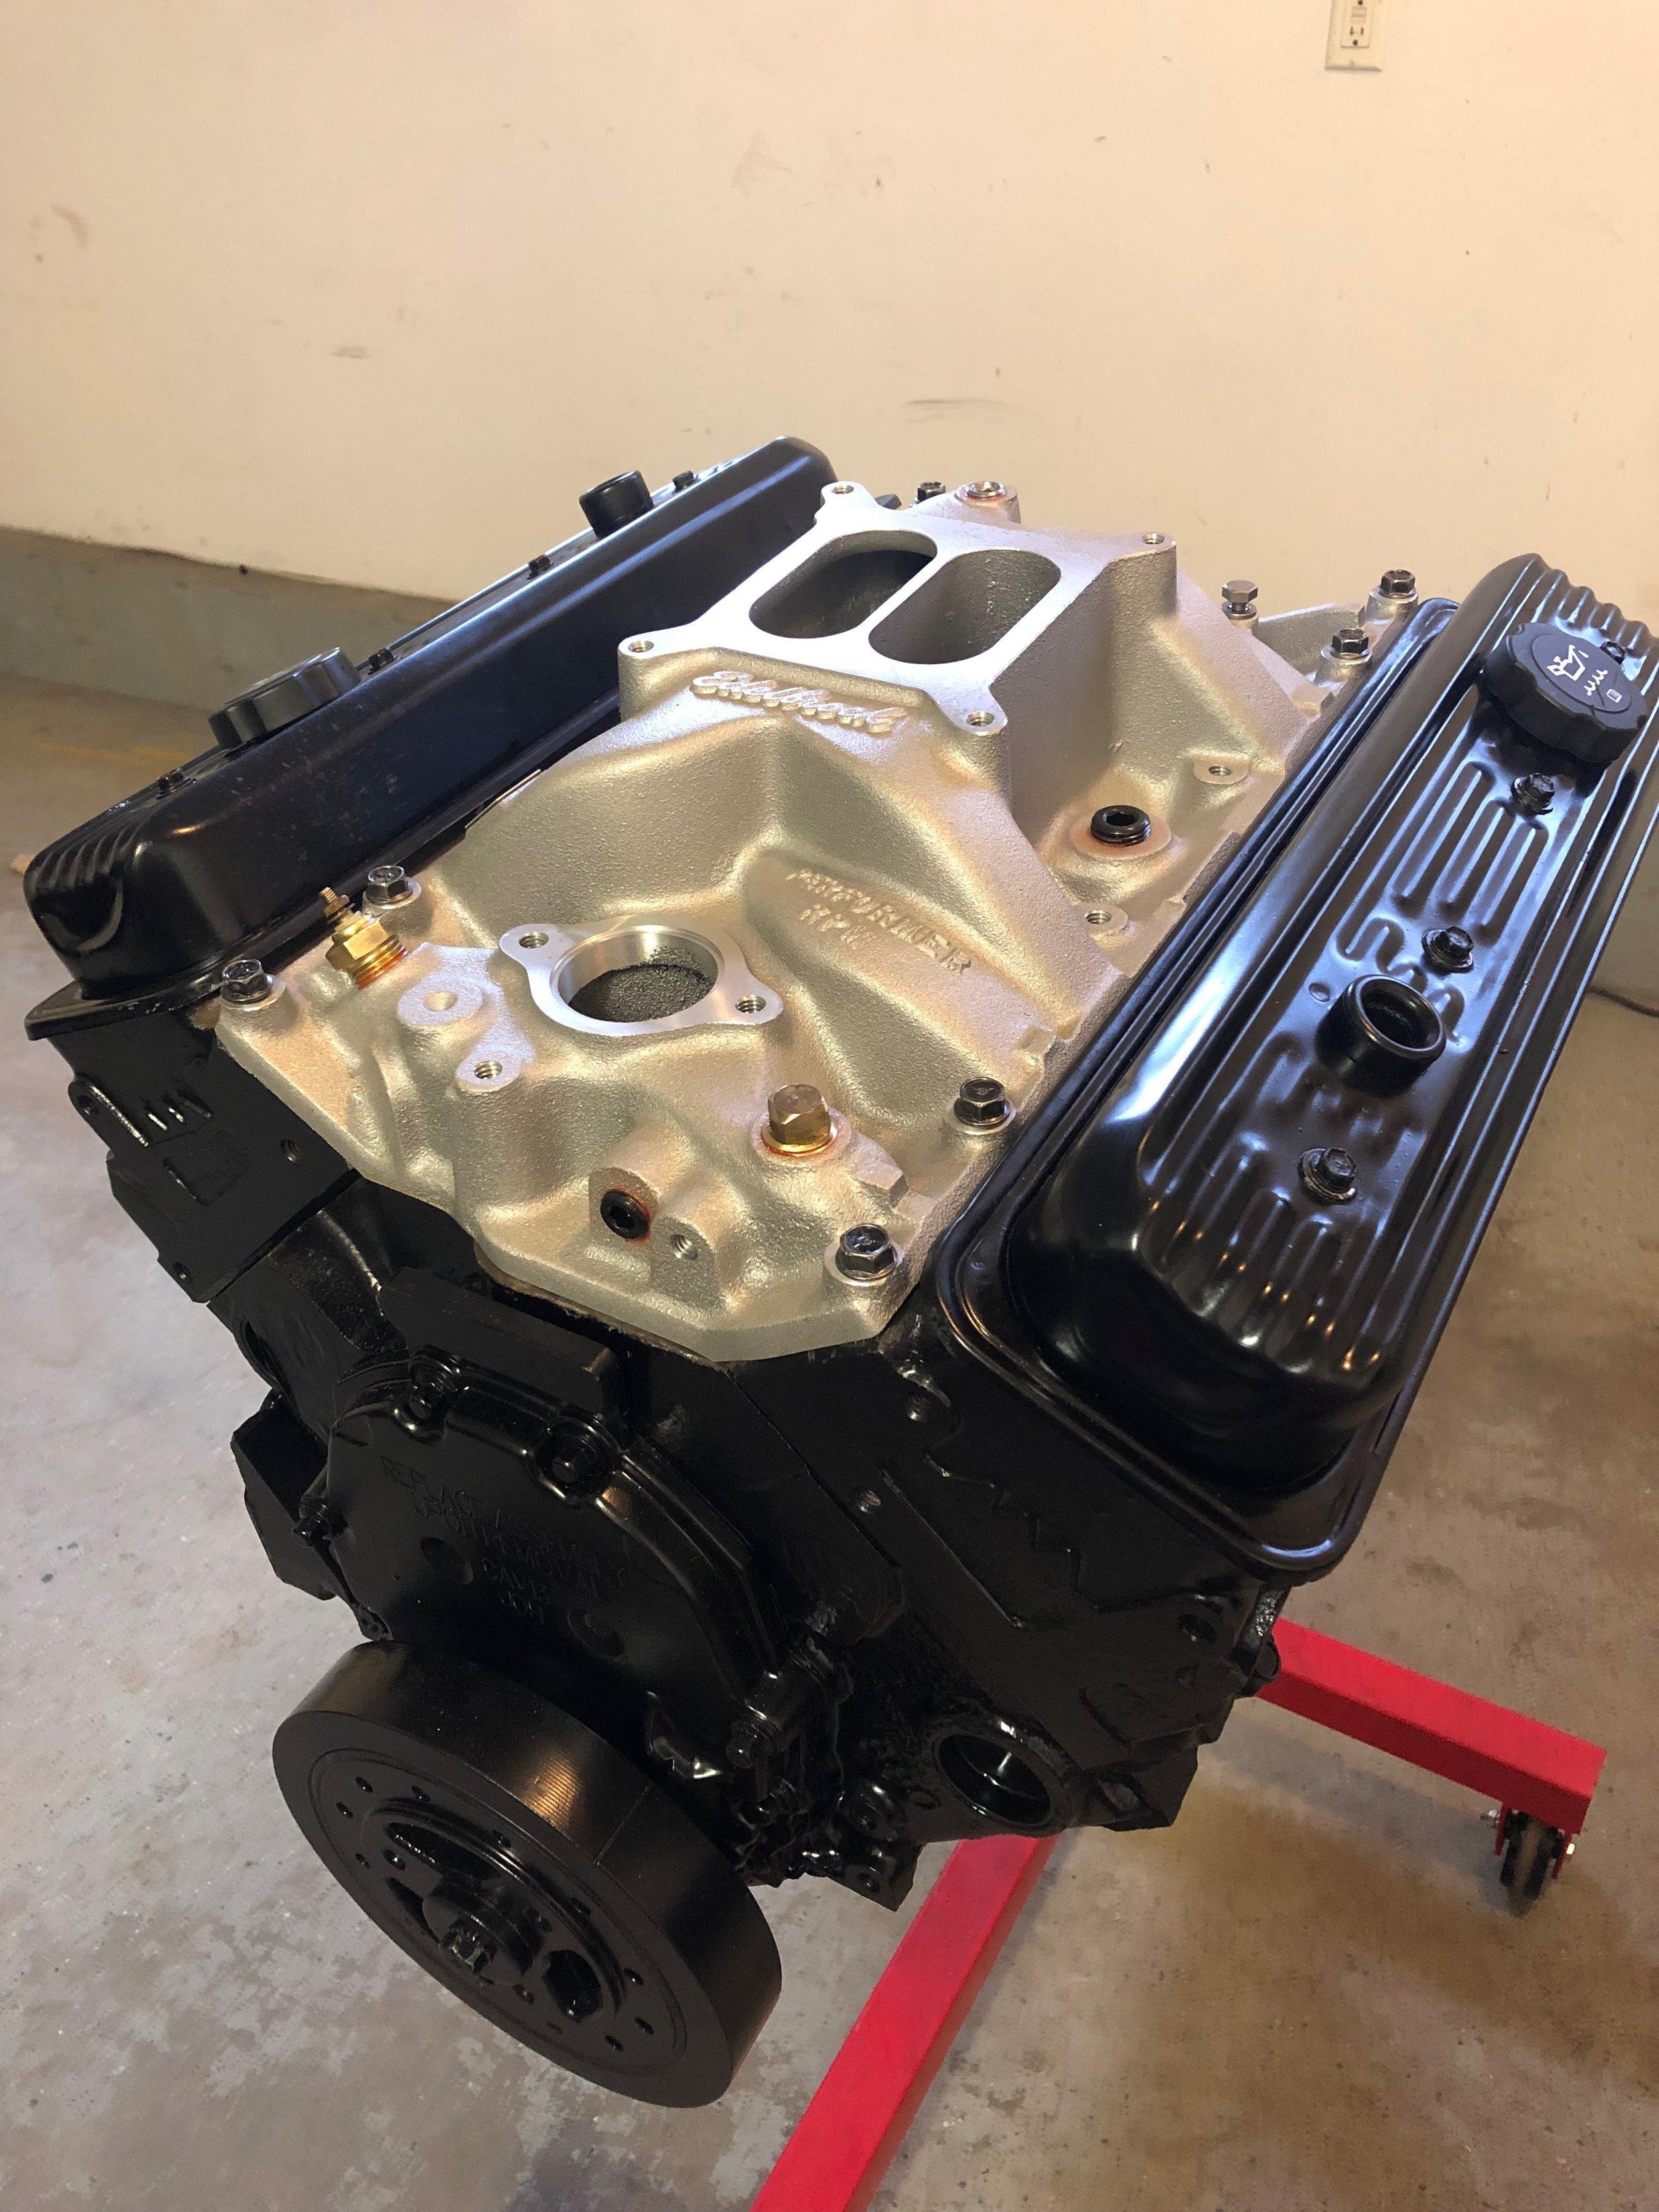 Ron marine engine.jpg